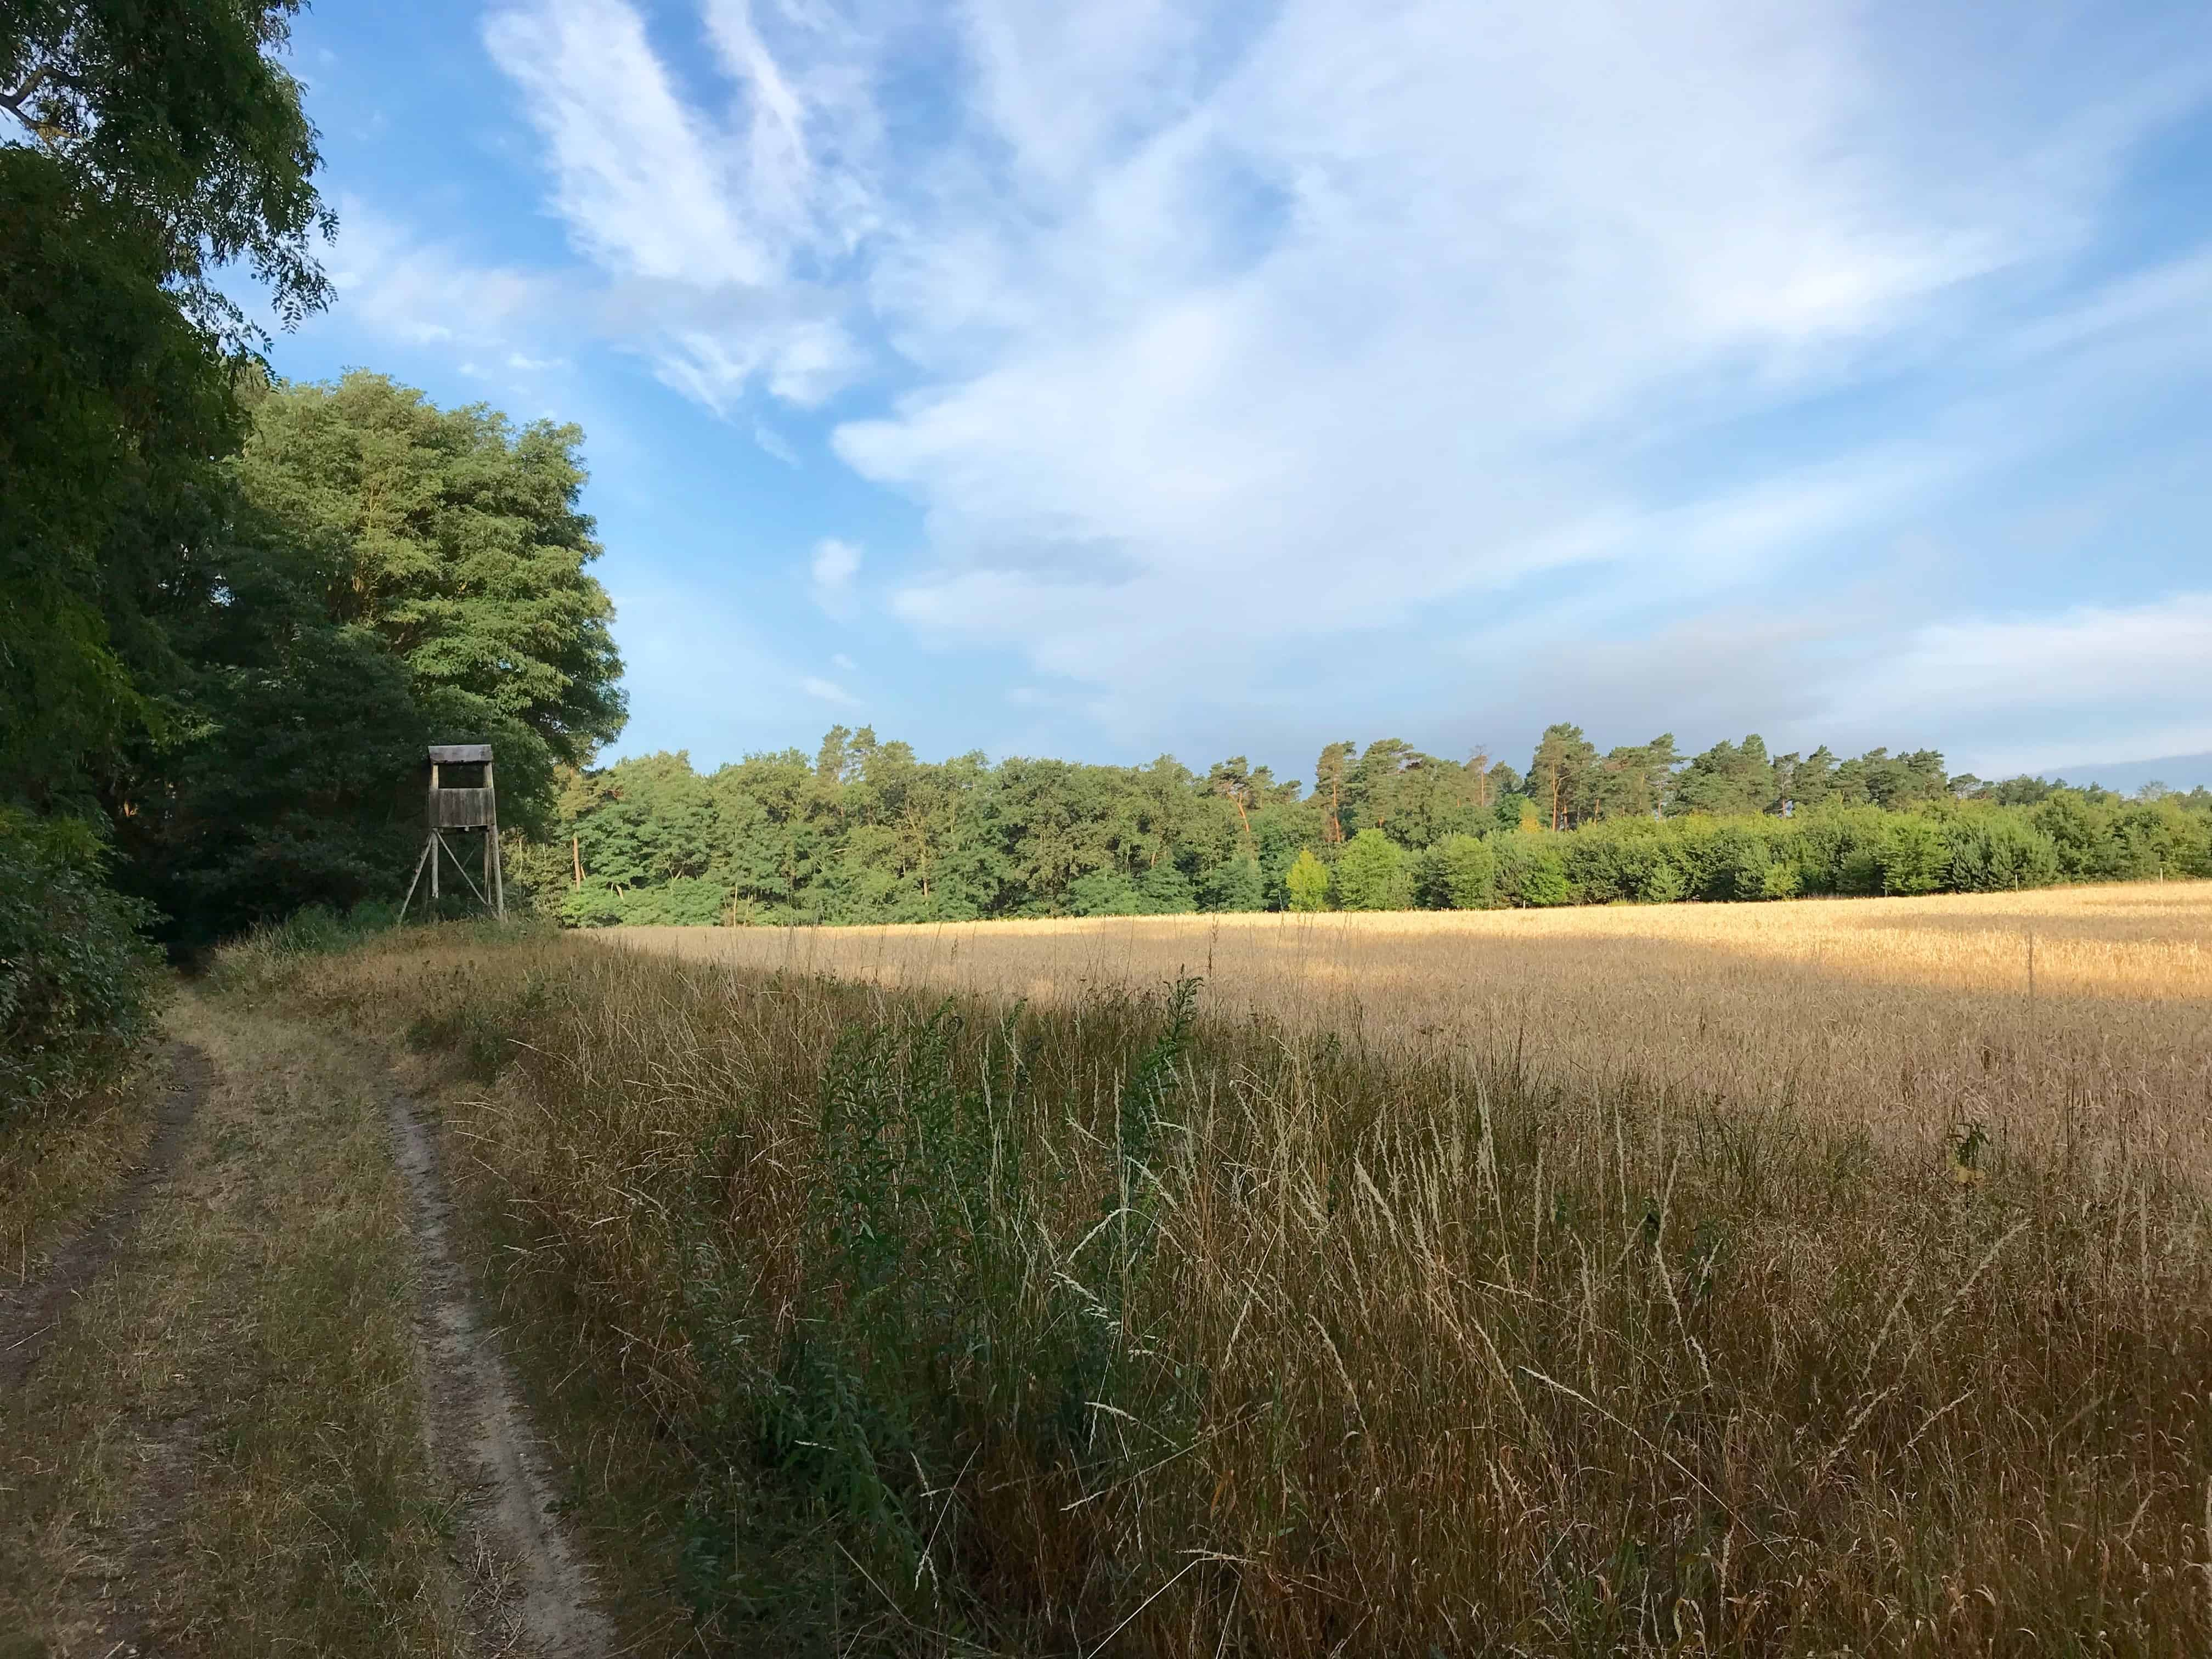 Meine 3. Etappe auf der Via Imperii: Saarmund - Beelitz - Misses Backpack